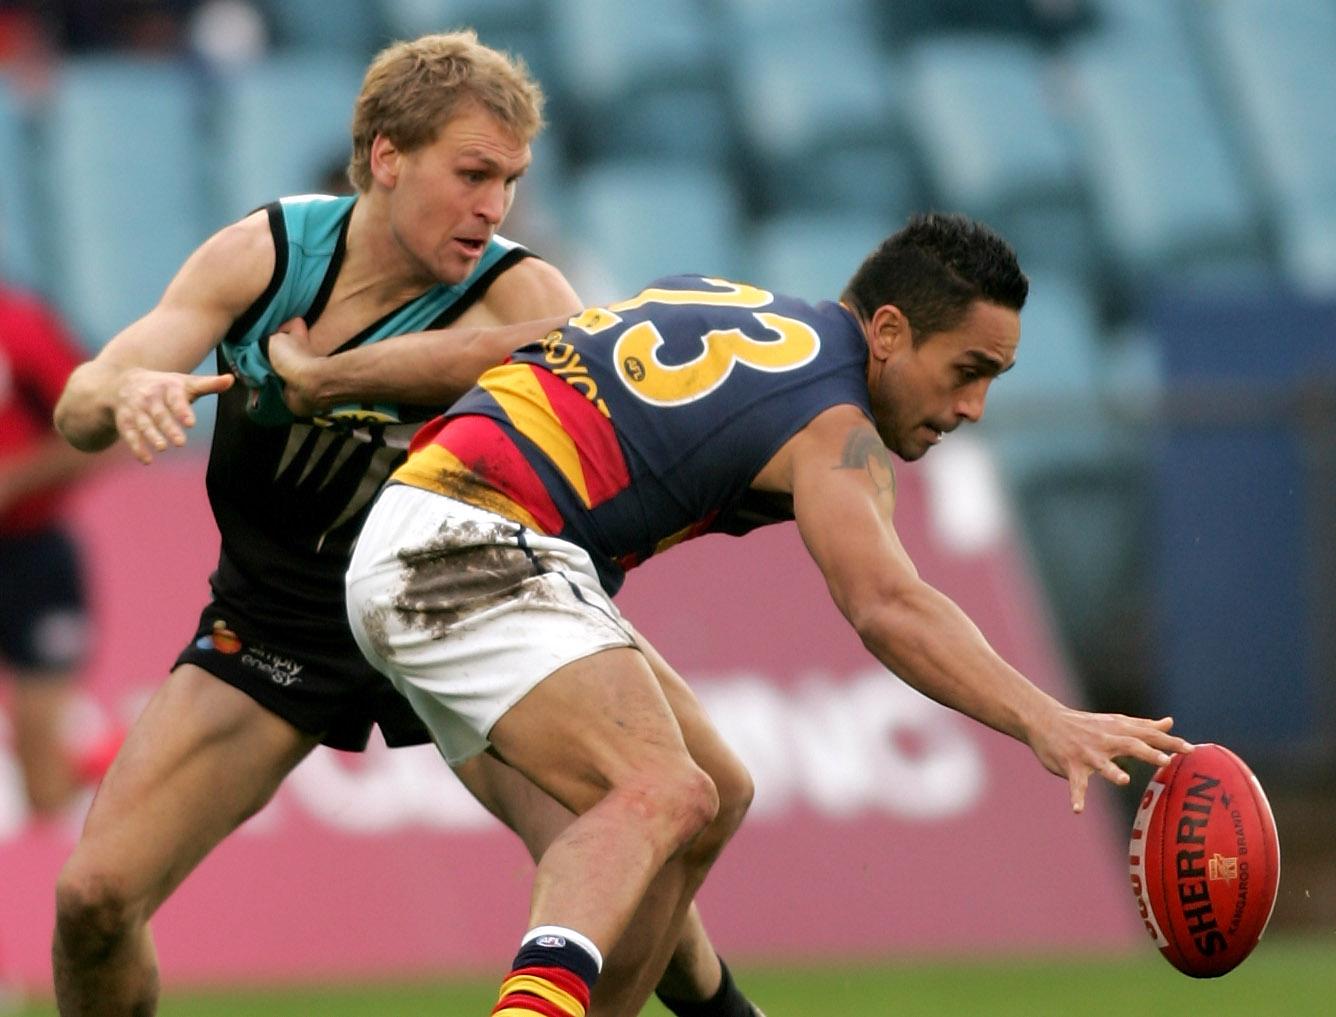 AFL 2008 Rd 16 - Port Adelaide v Adelaide